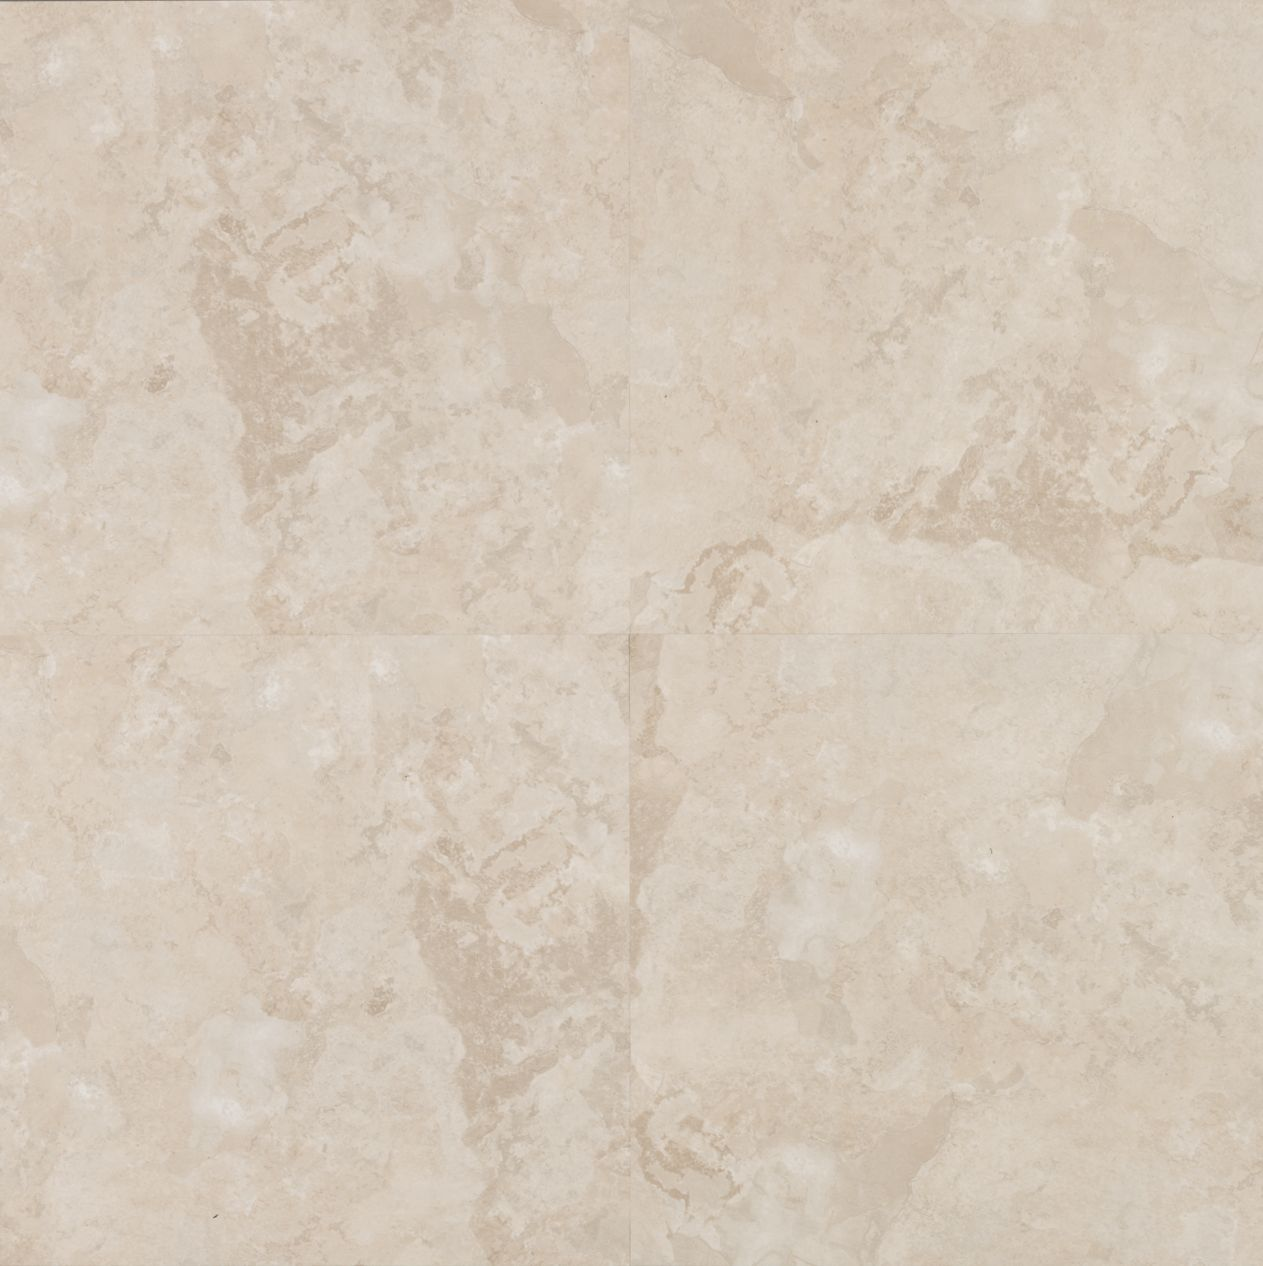 Permanence Tile 18X18 Beige    97